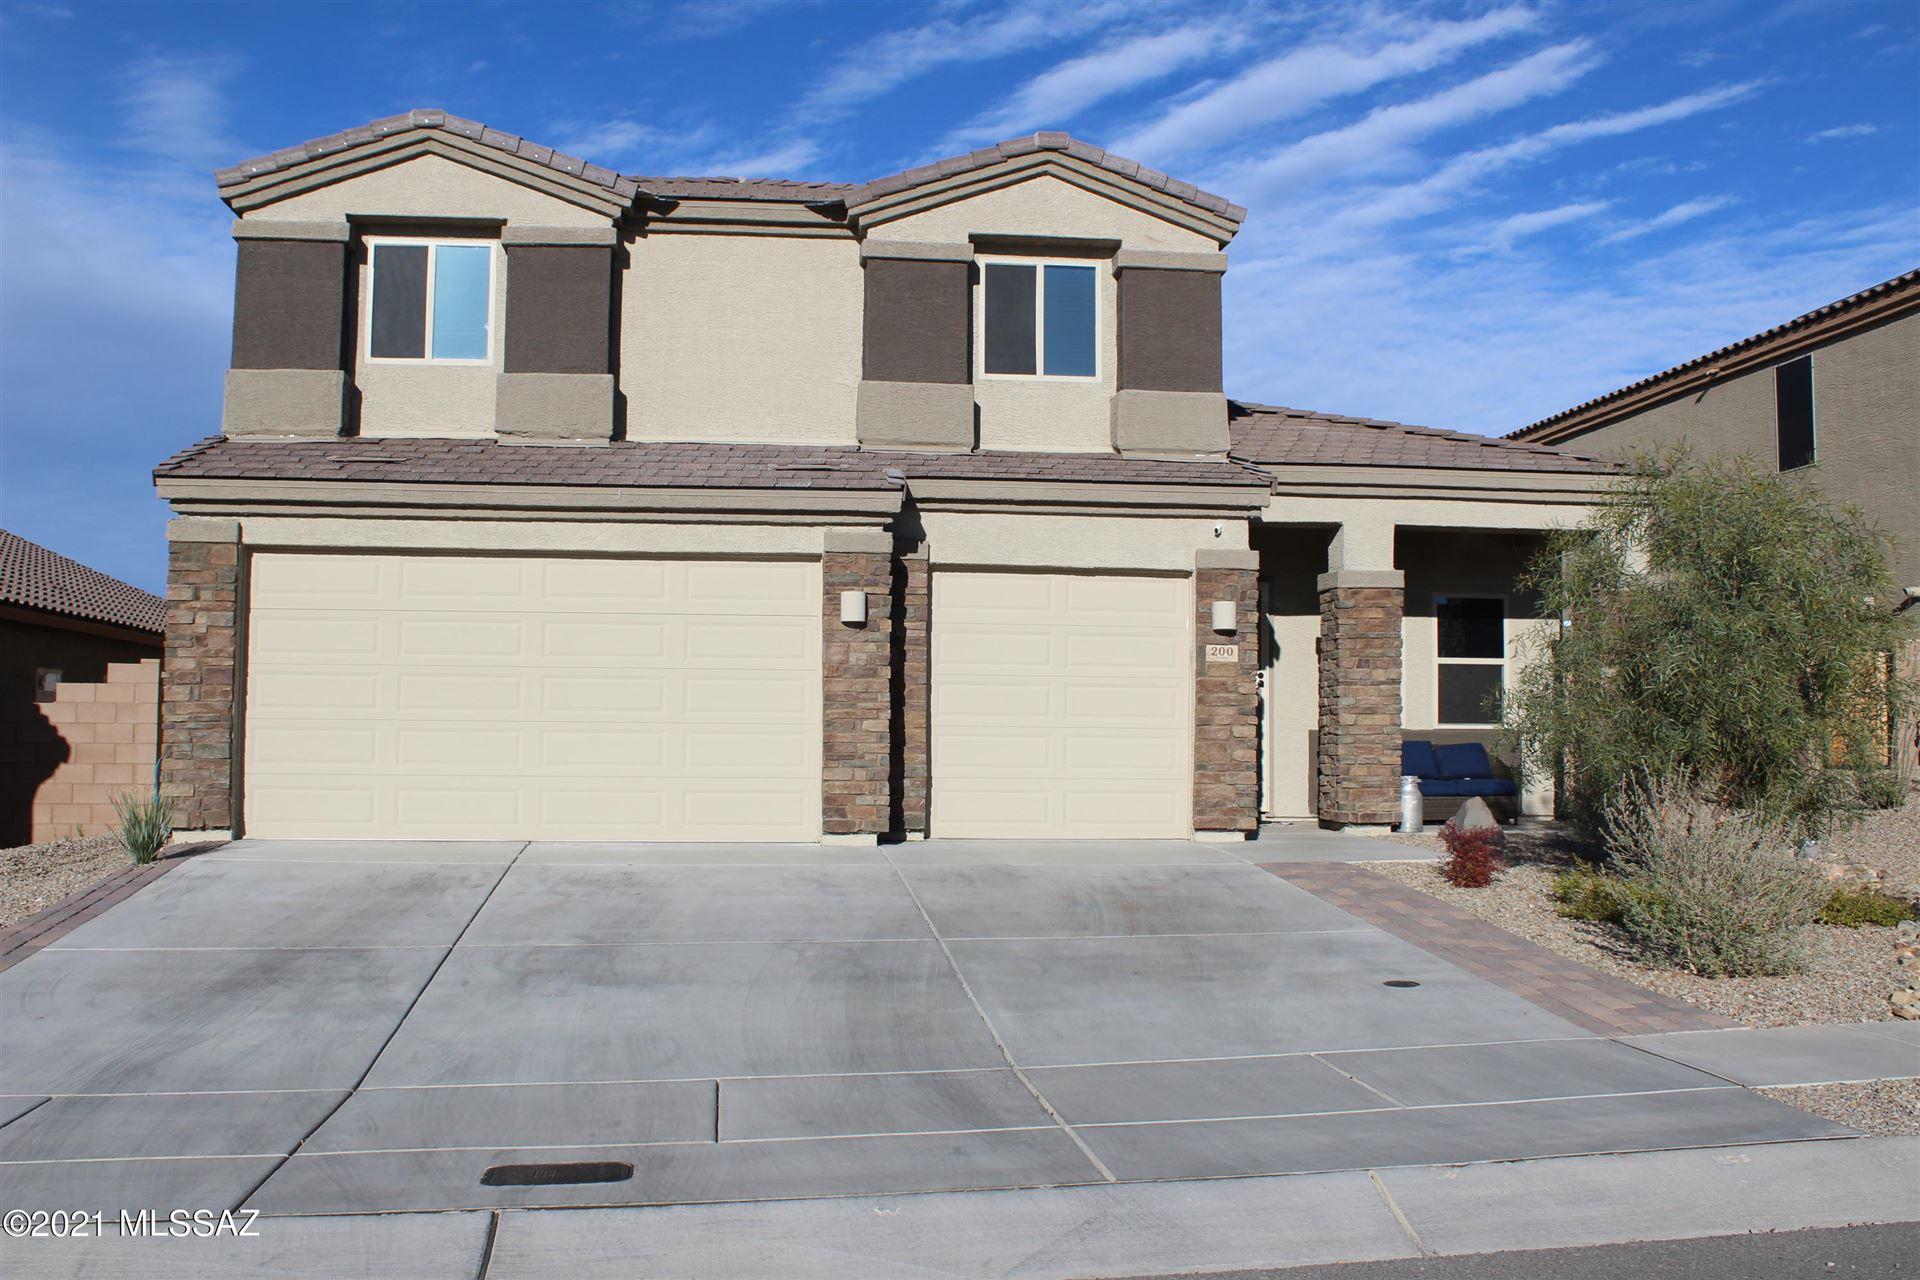 200 W Sg Posey S Street, Vail, AZ 85641 - #: 22102536